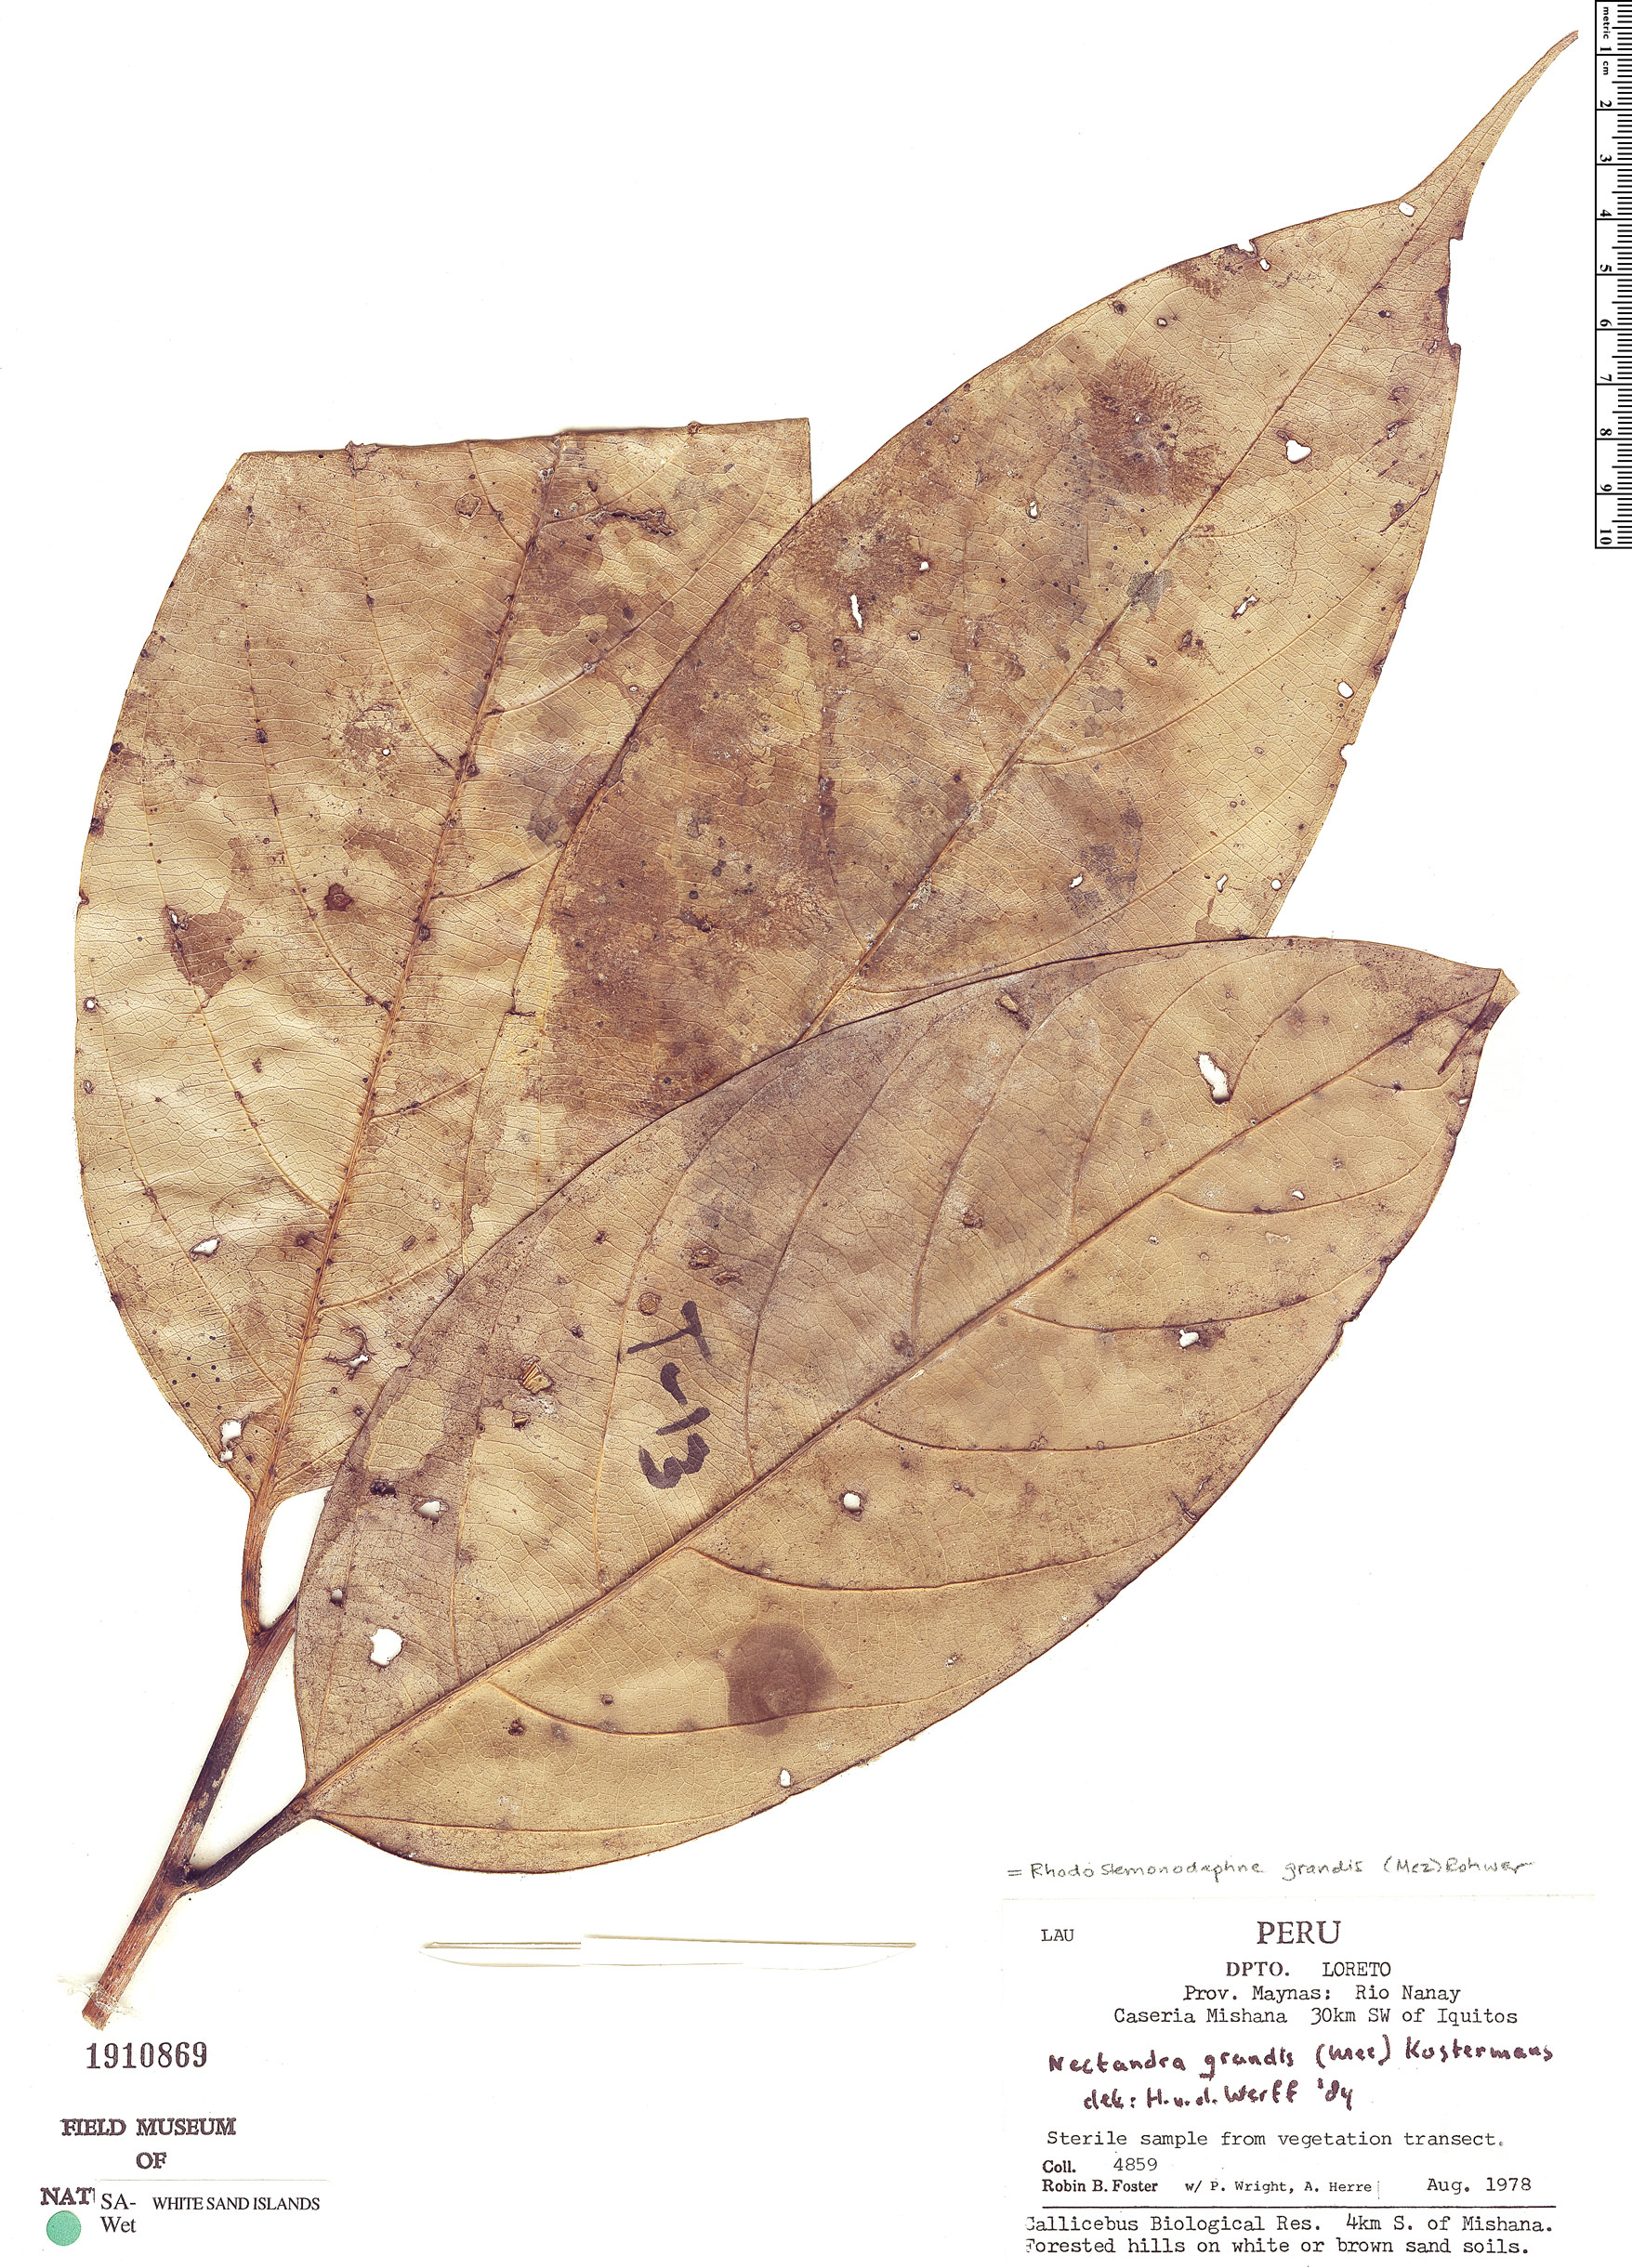 Specimen: Rhodostemonodaphne grandis